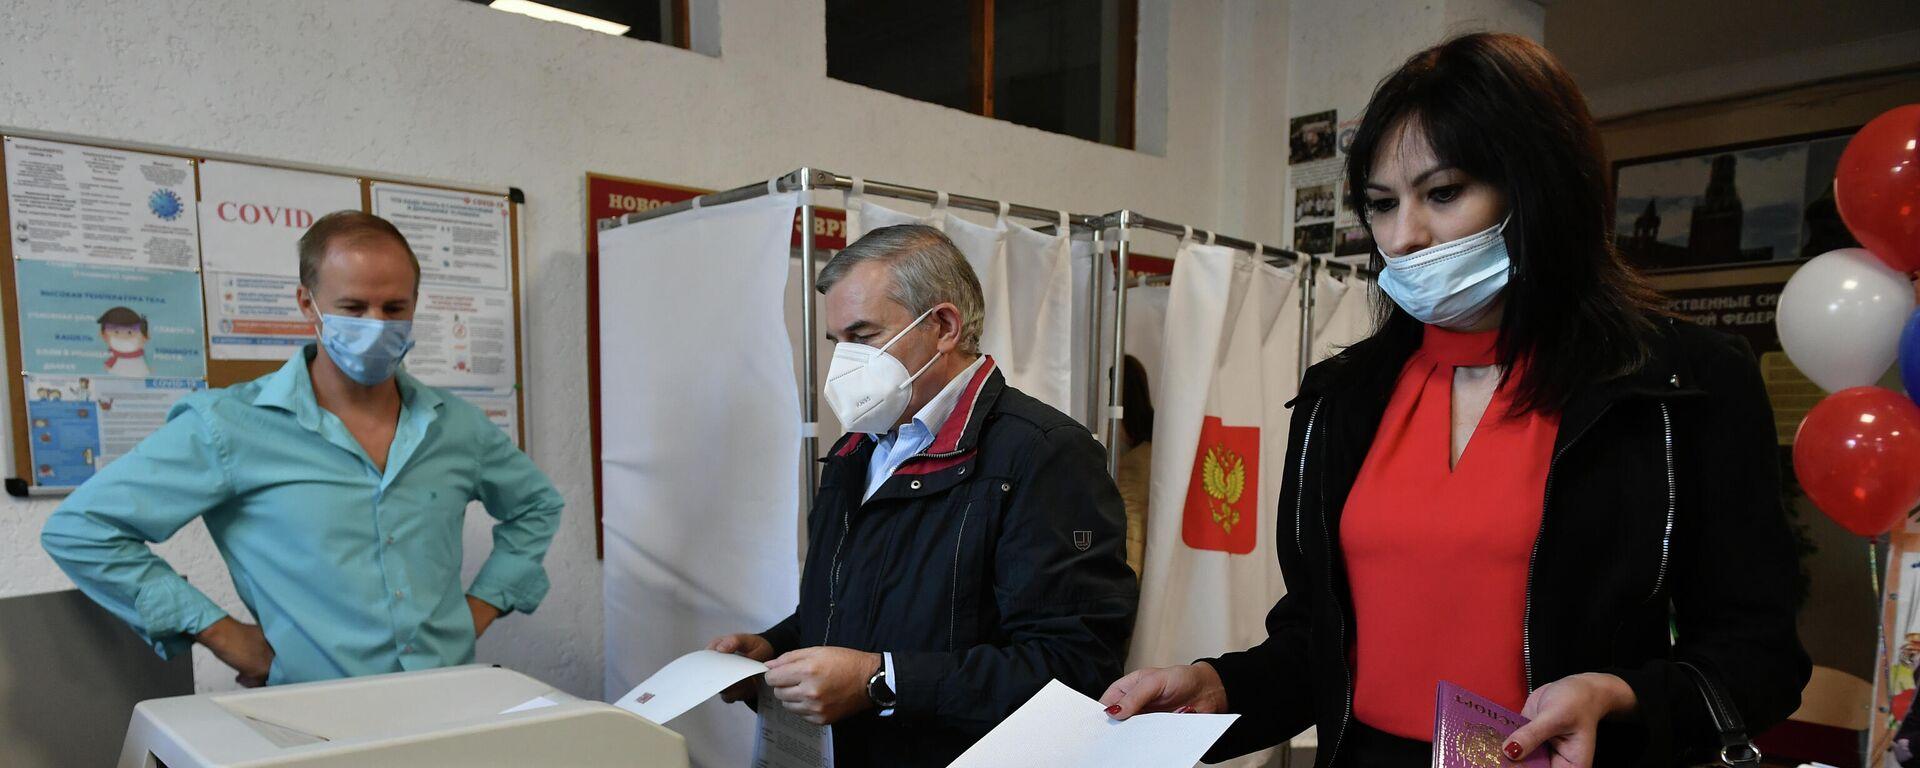 Elecciones en Crimea - Sputnik Mundo, 1920, 18.09.2021